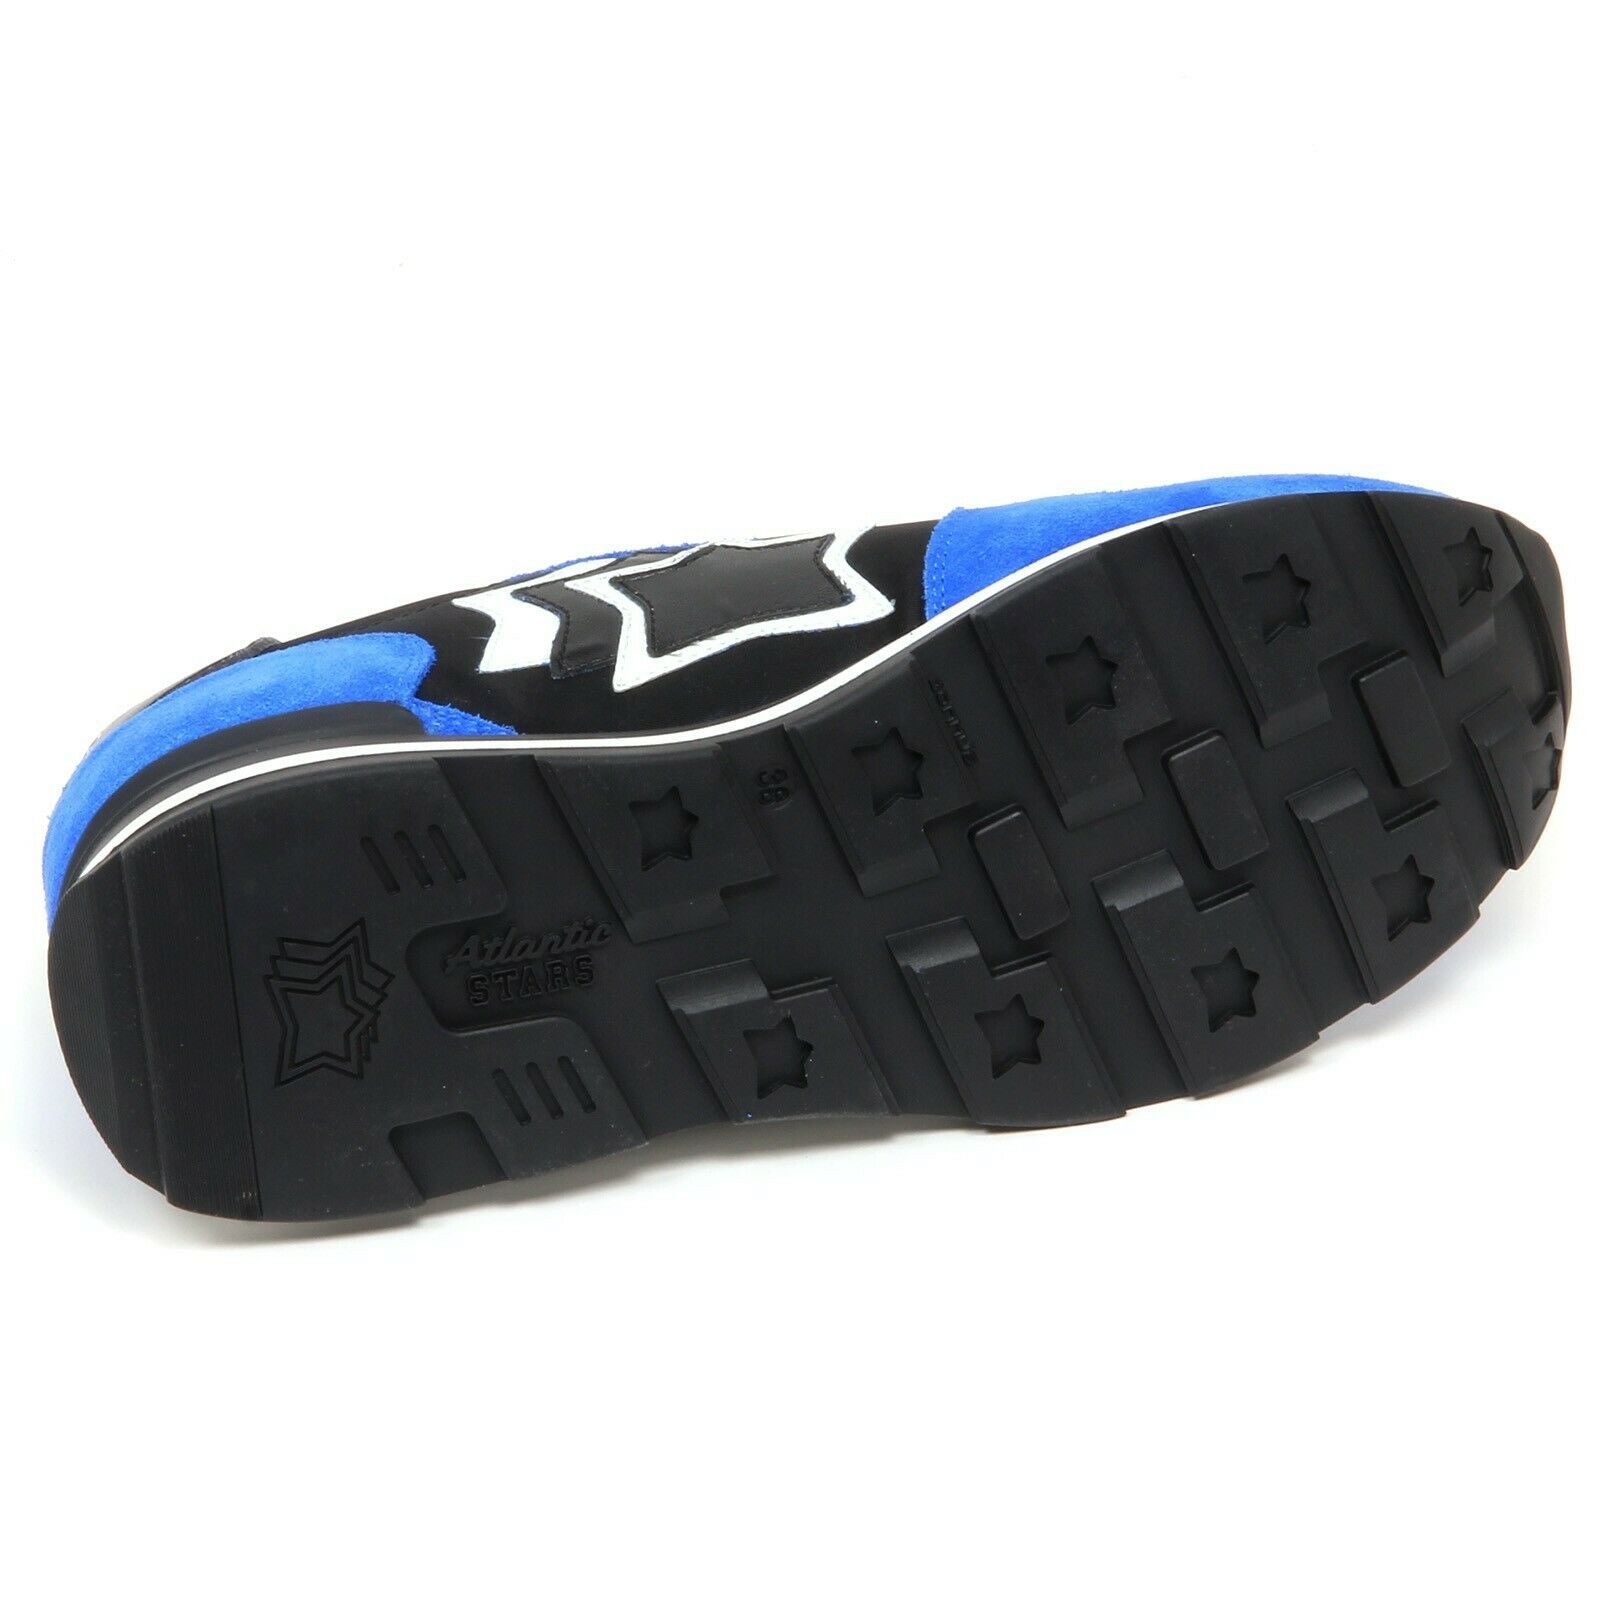 F6118 scarpe da ginnastica donna blutte nero ATLANTIC STARS STARS STARS GEMMA scarpe woman 0292d1